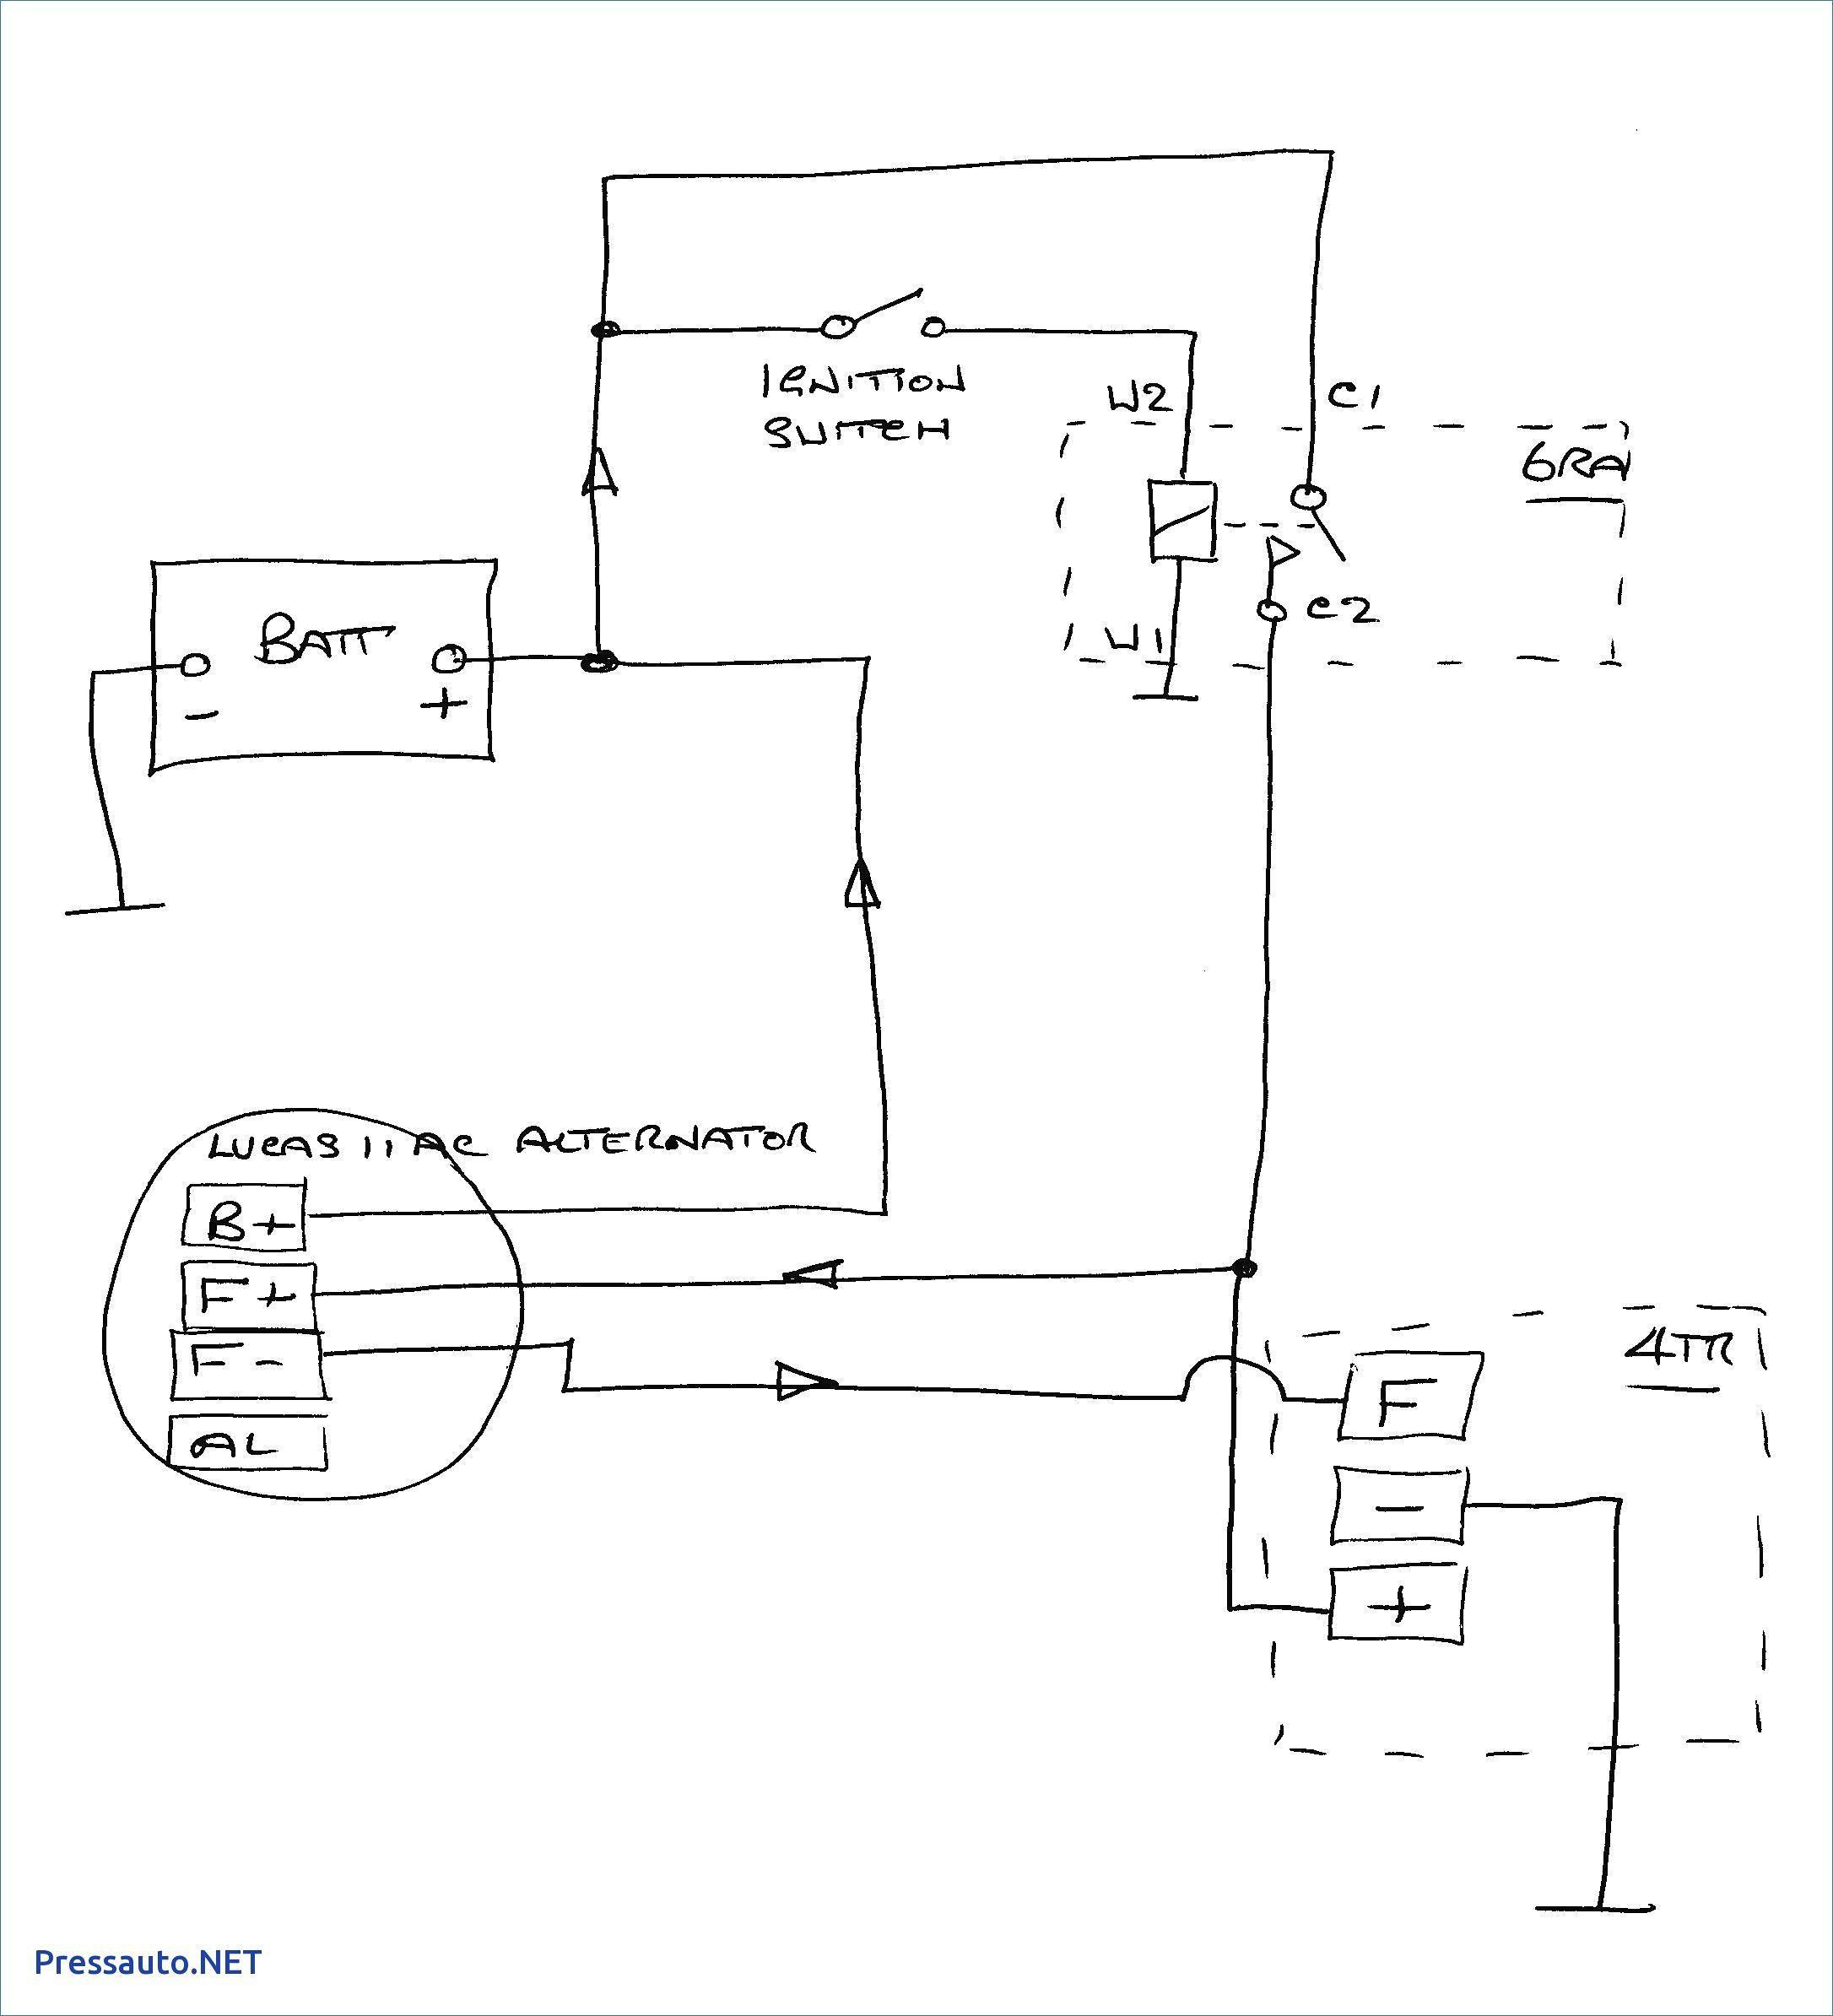 4 Wire Alternator Wiring - Wiring Diagrams Hubs - Alternator Wiring Diagram